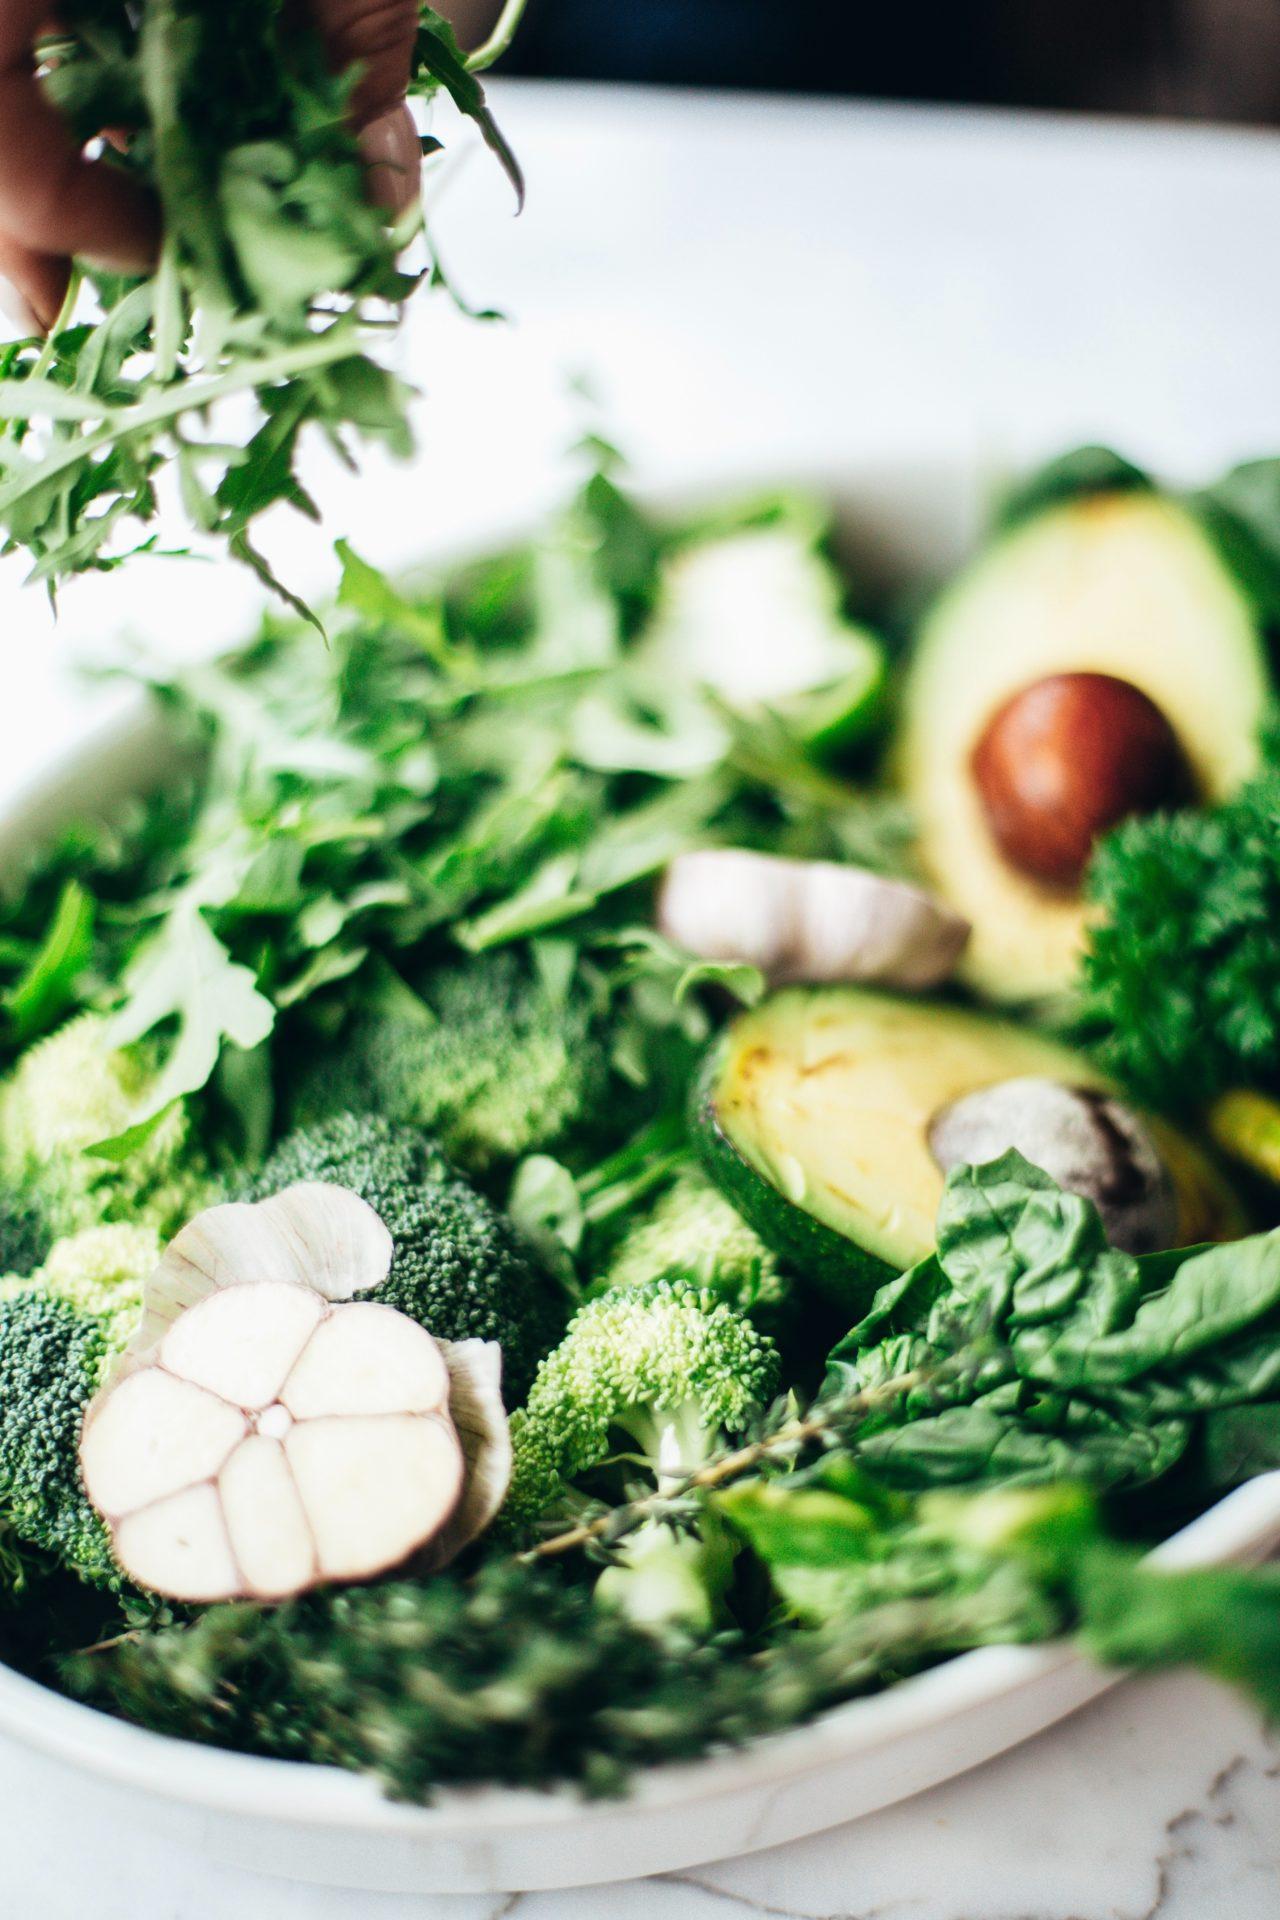 broccoli-delicious-diet-1580466-1280x1920.jpg